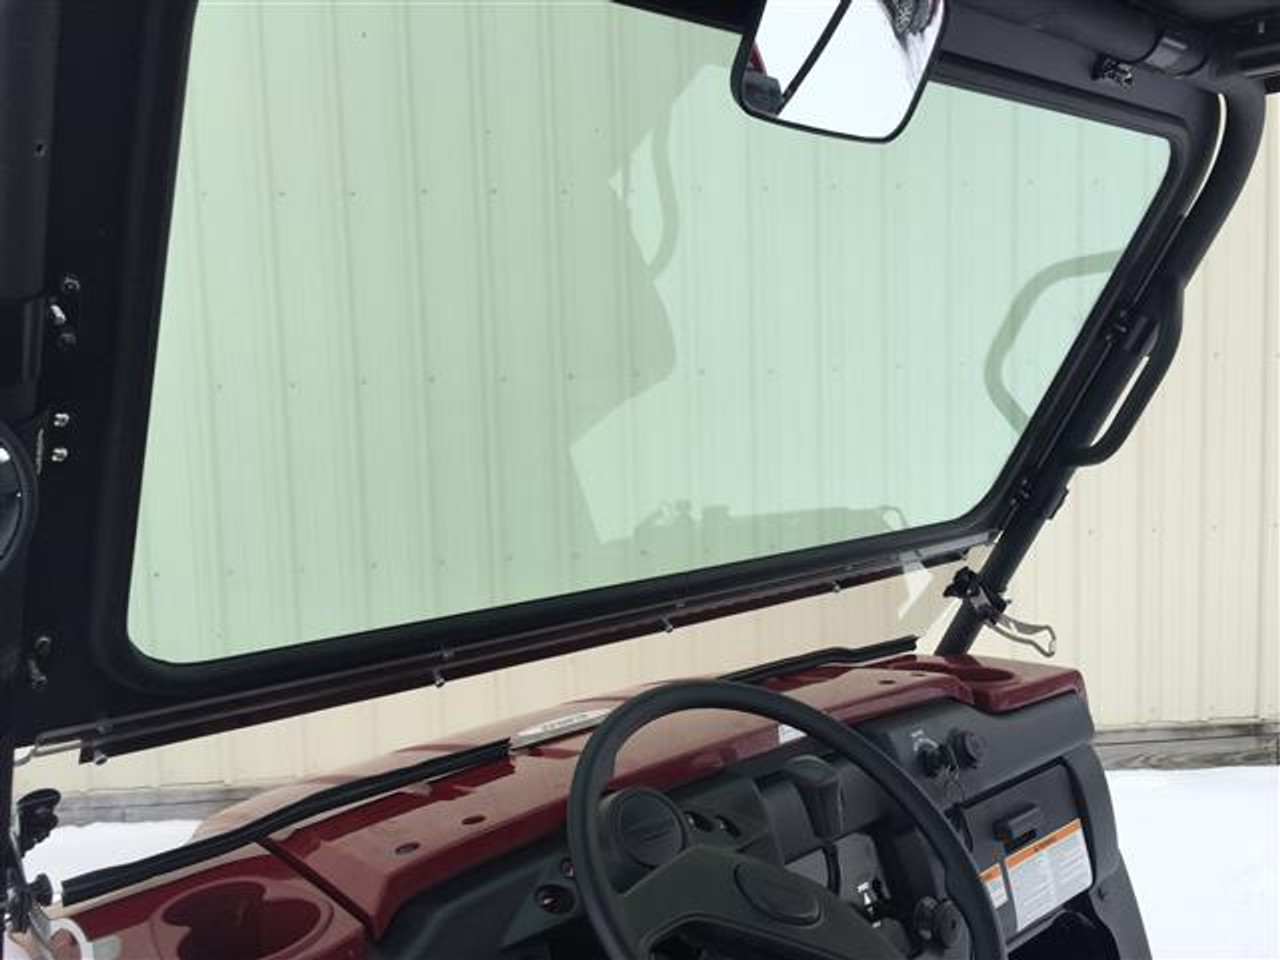 Moose Utility Clear Full Windshield For 03-08 Kawasaki KAF 950 Mule 3010 Diesel